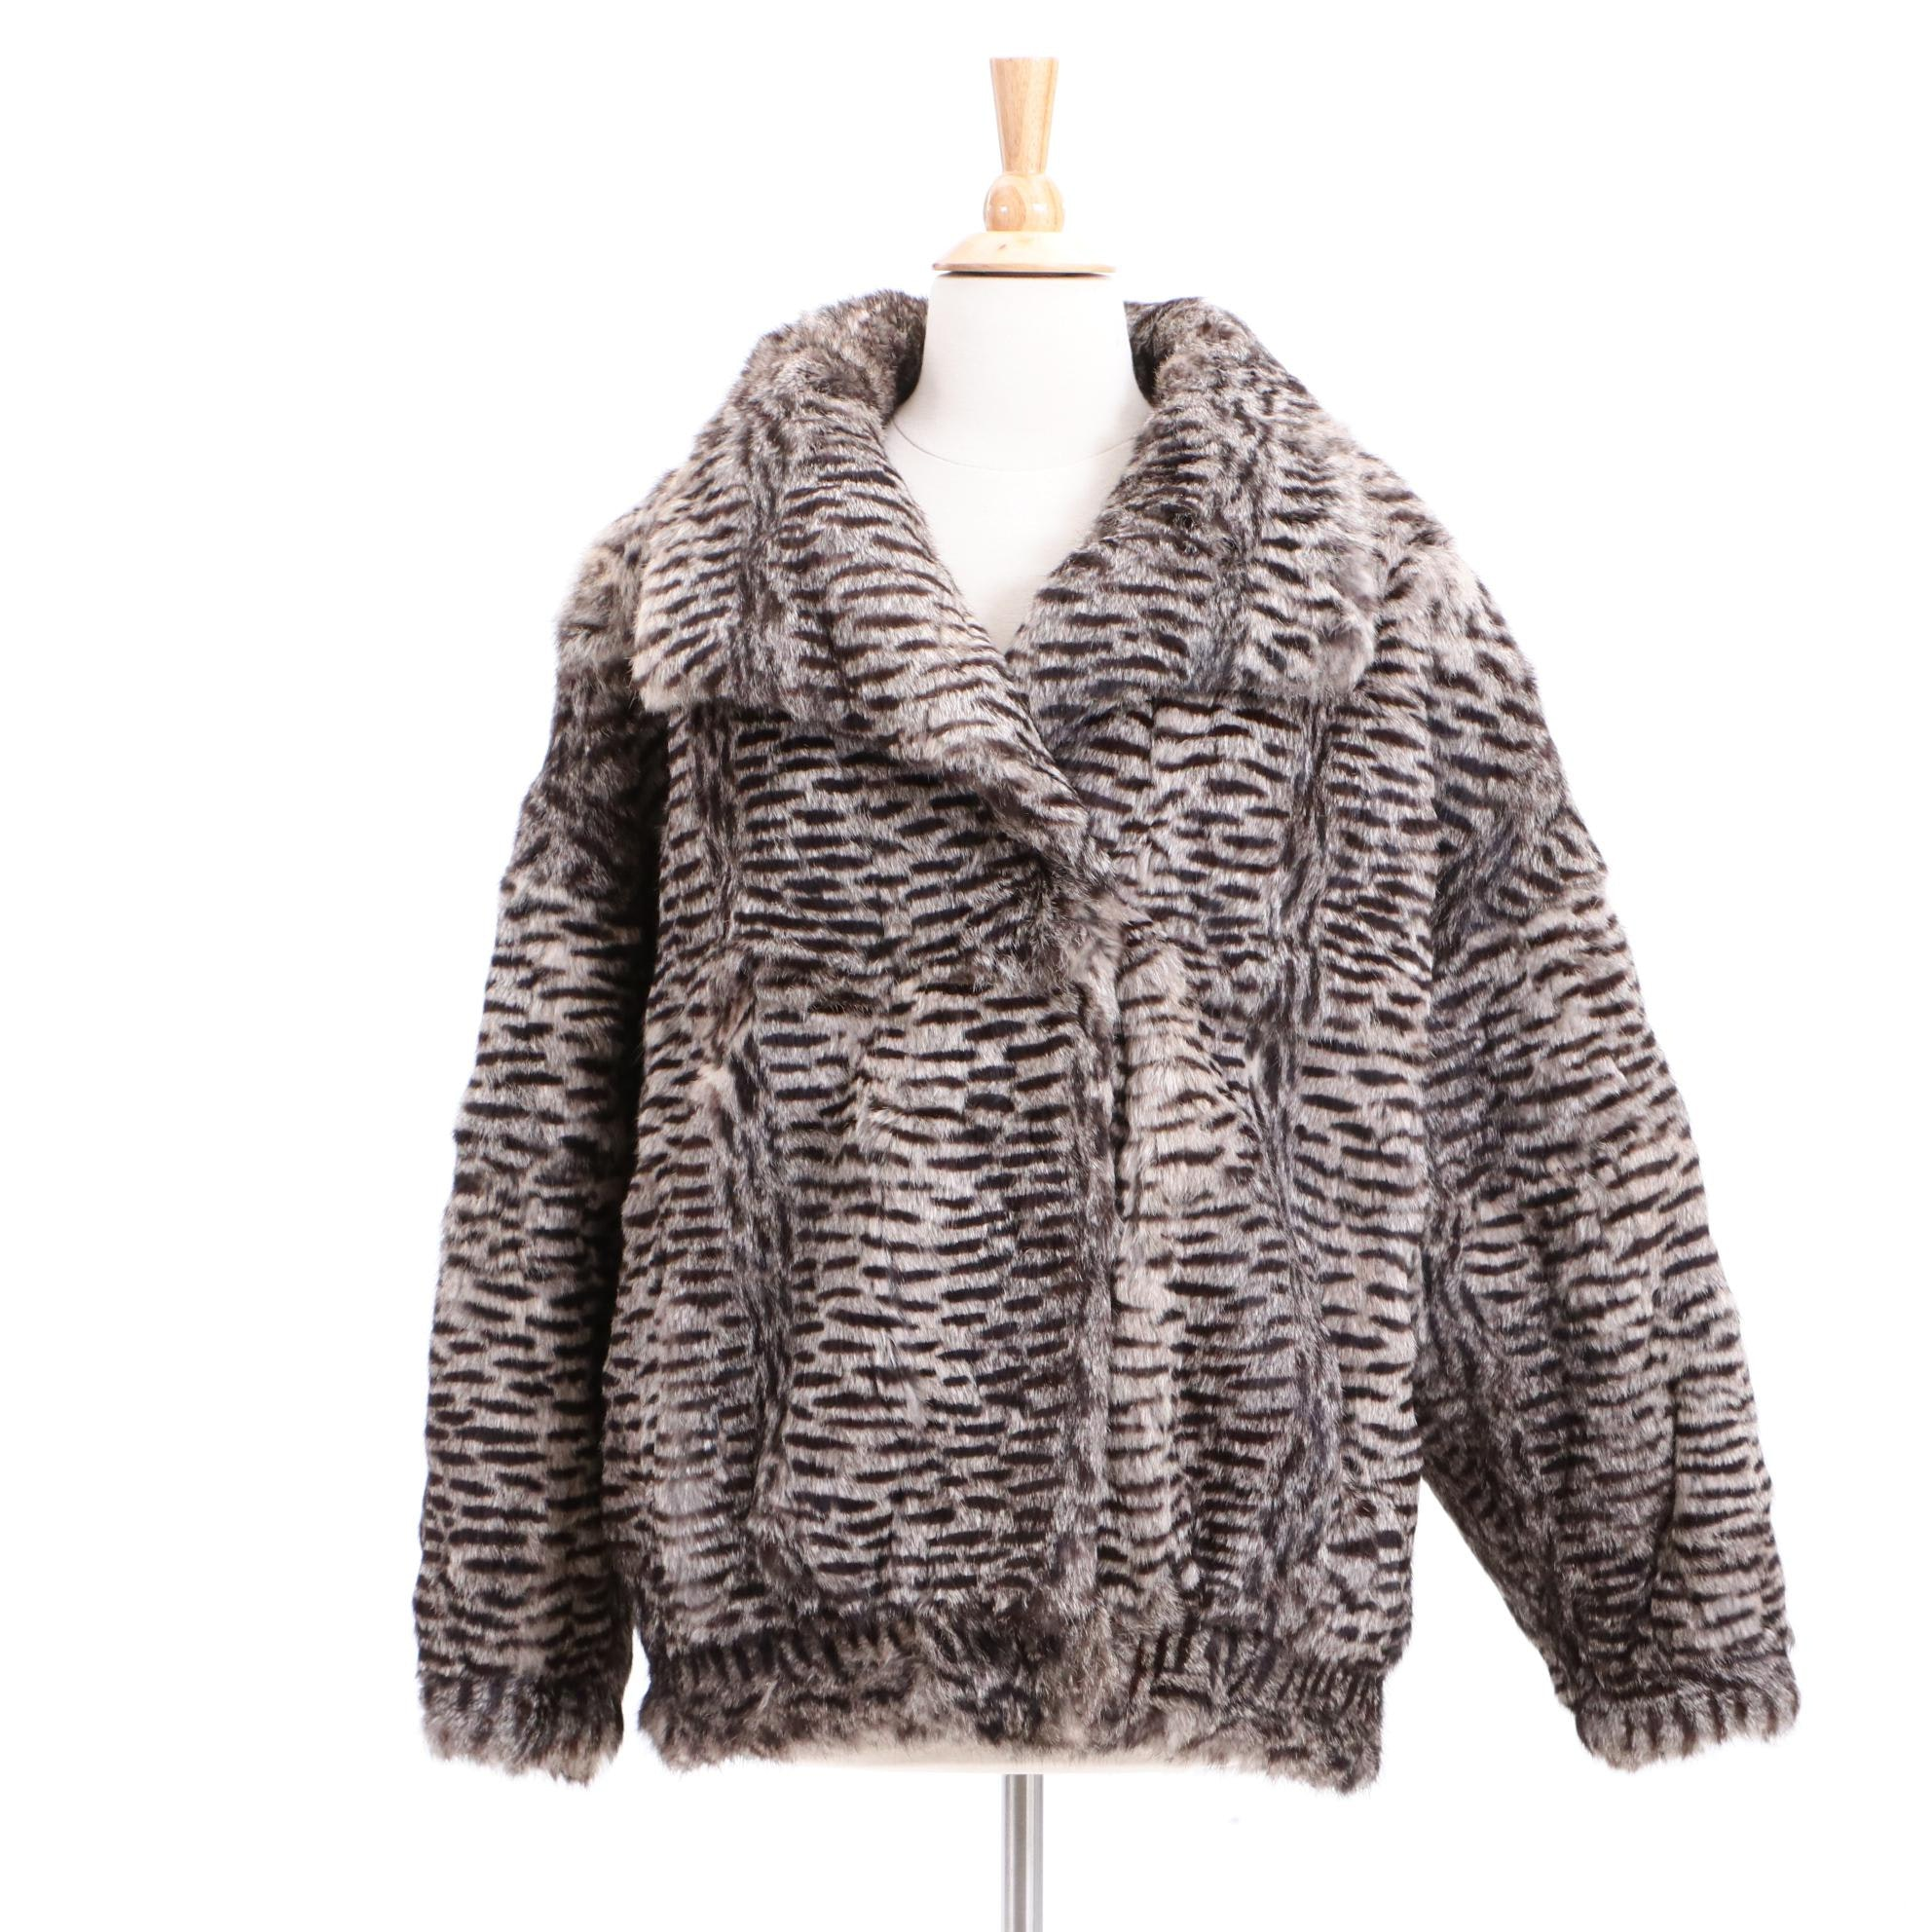 Lori Wilkins for Oh Dyed Rabbit Fur Coat